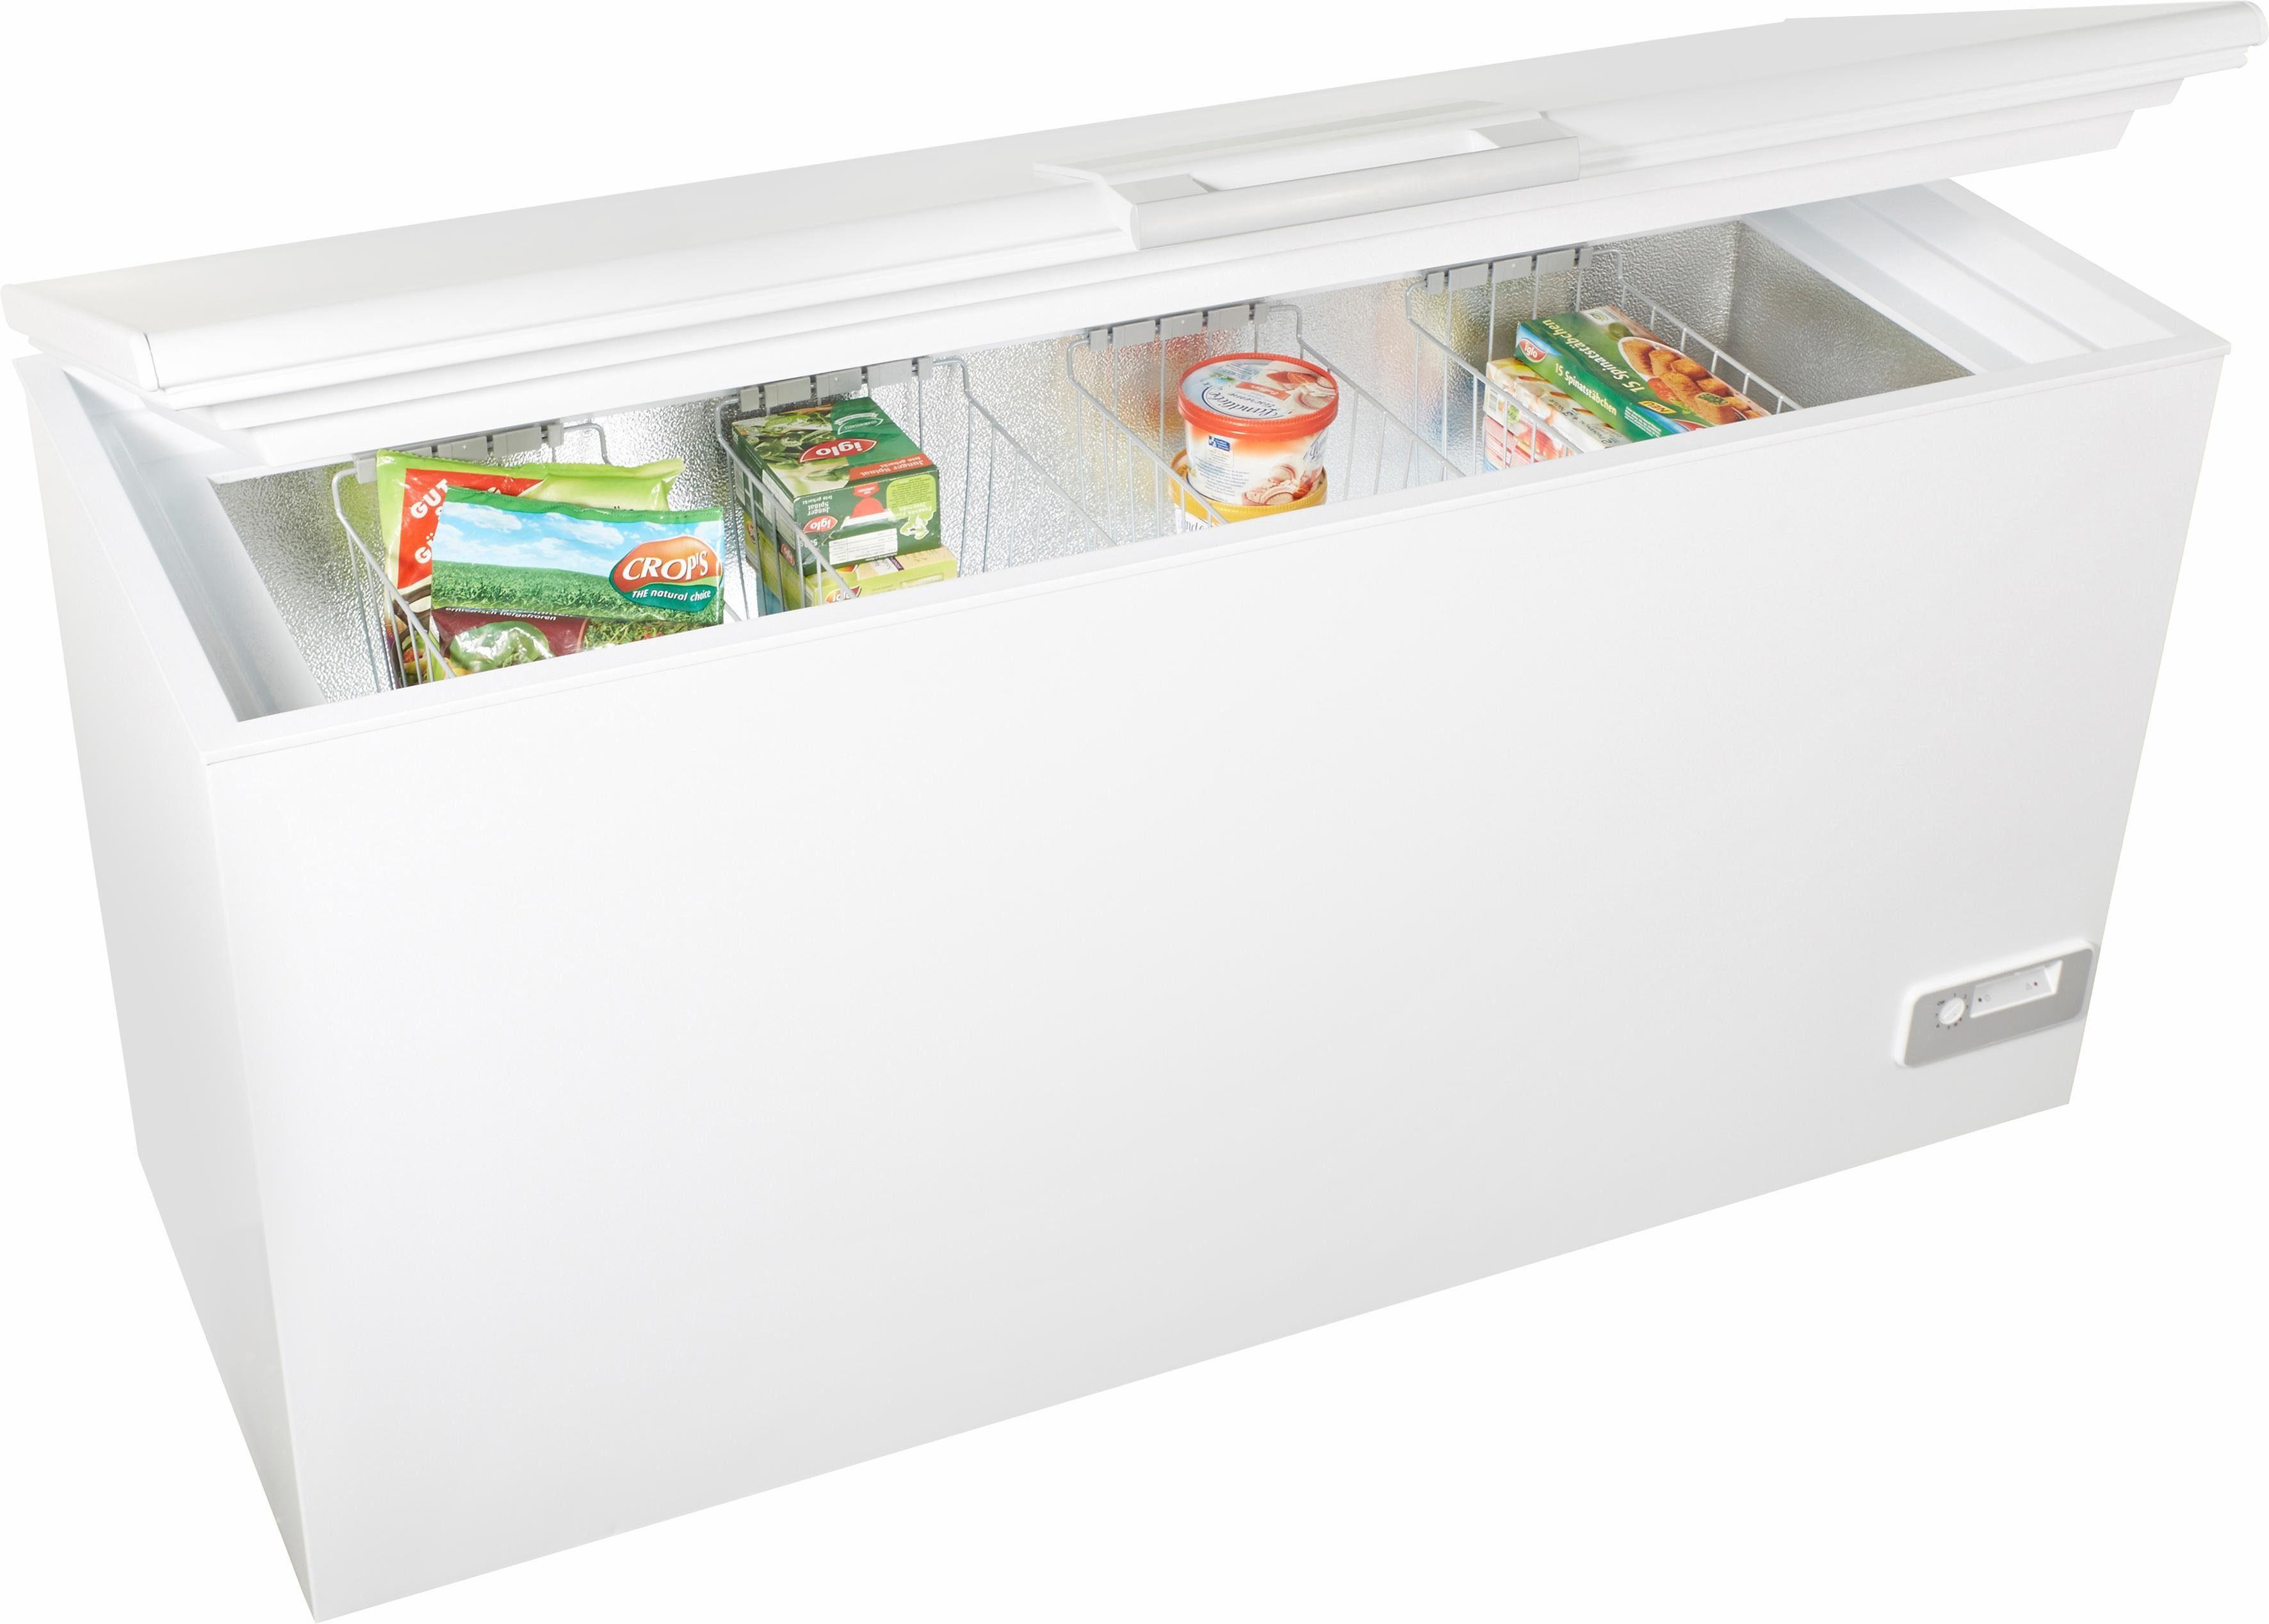 Aeg Kühlschrank Eisbildung : Aeg gefriertruhe ahb lw cm breit l otto